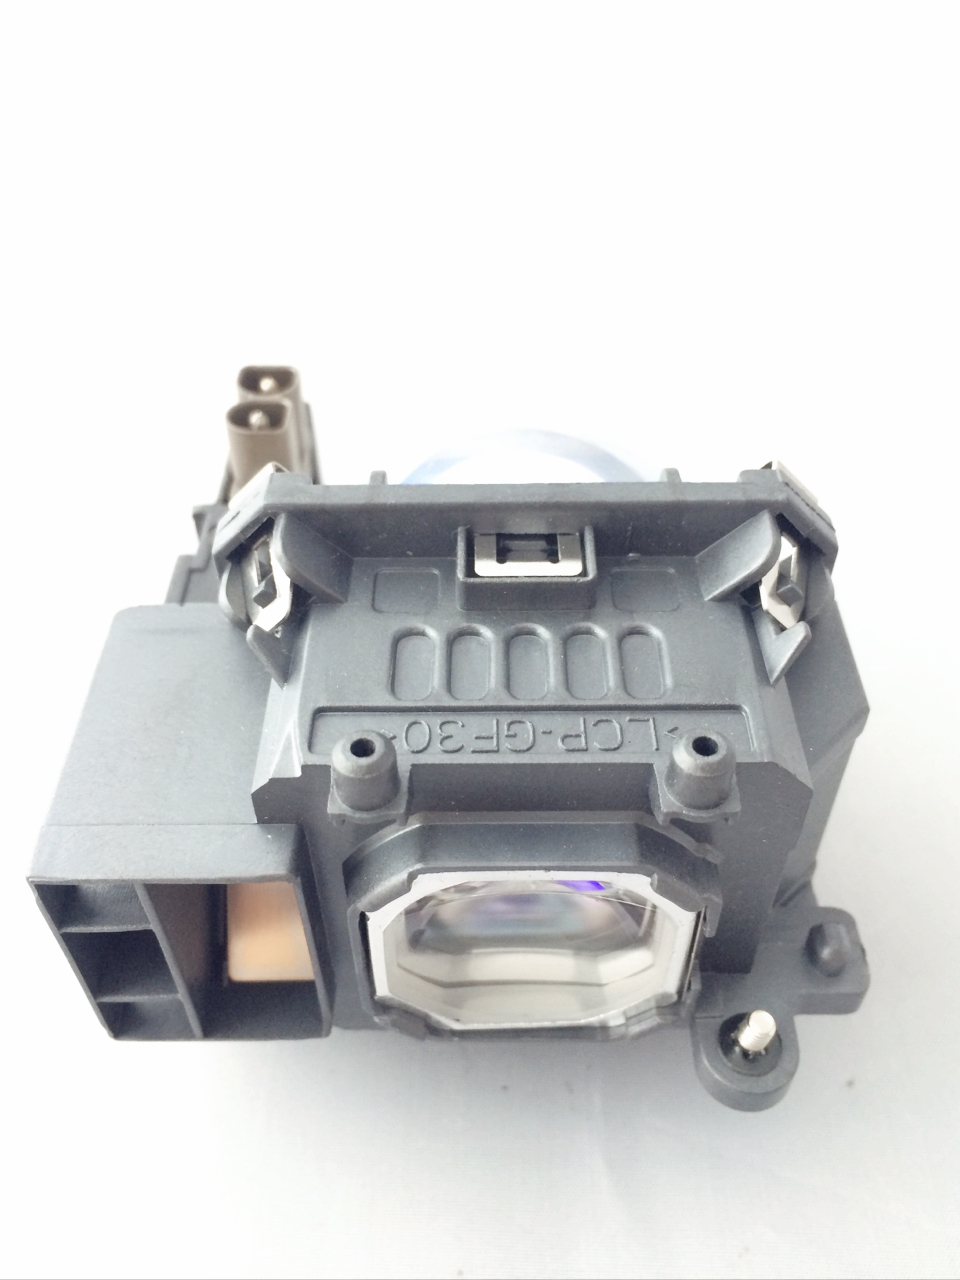 SHENG Free Shipping projector lamp bulb NP17LP for NP-P350W NP-P420X M300WS M350XS M420X sheng yu 20 f